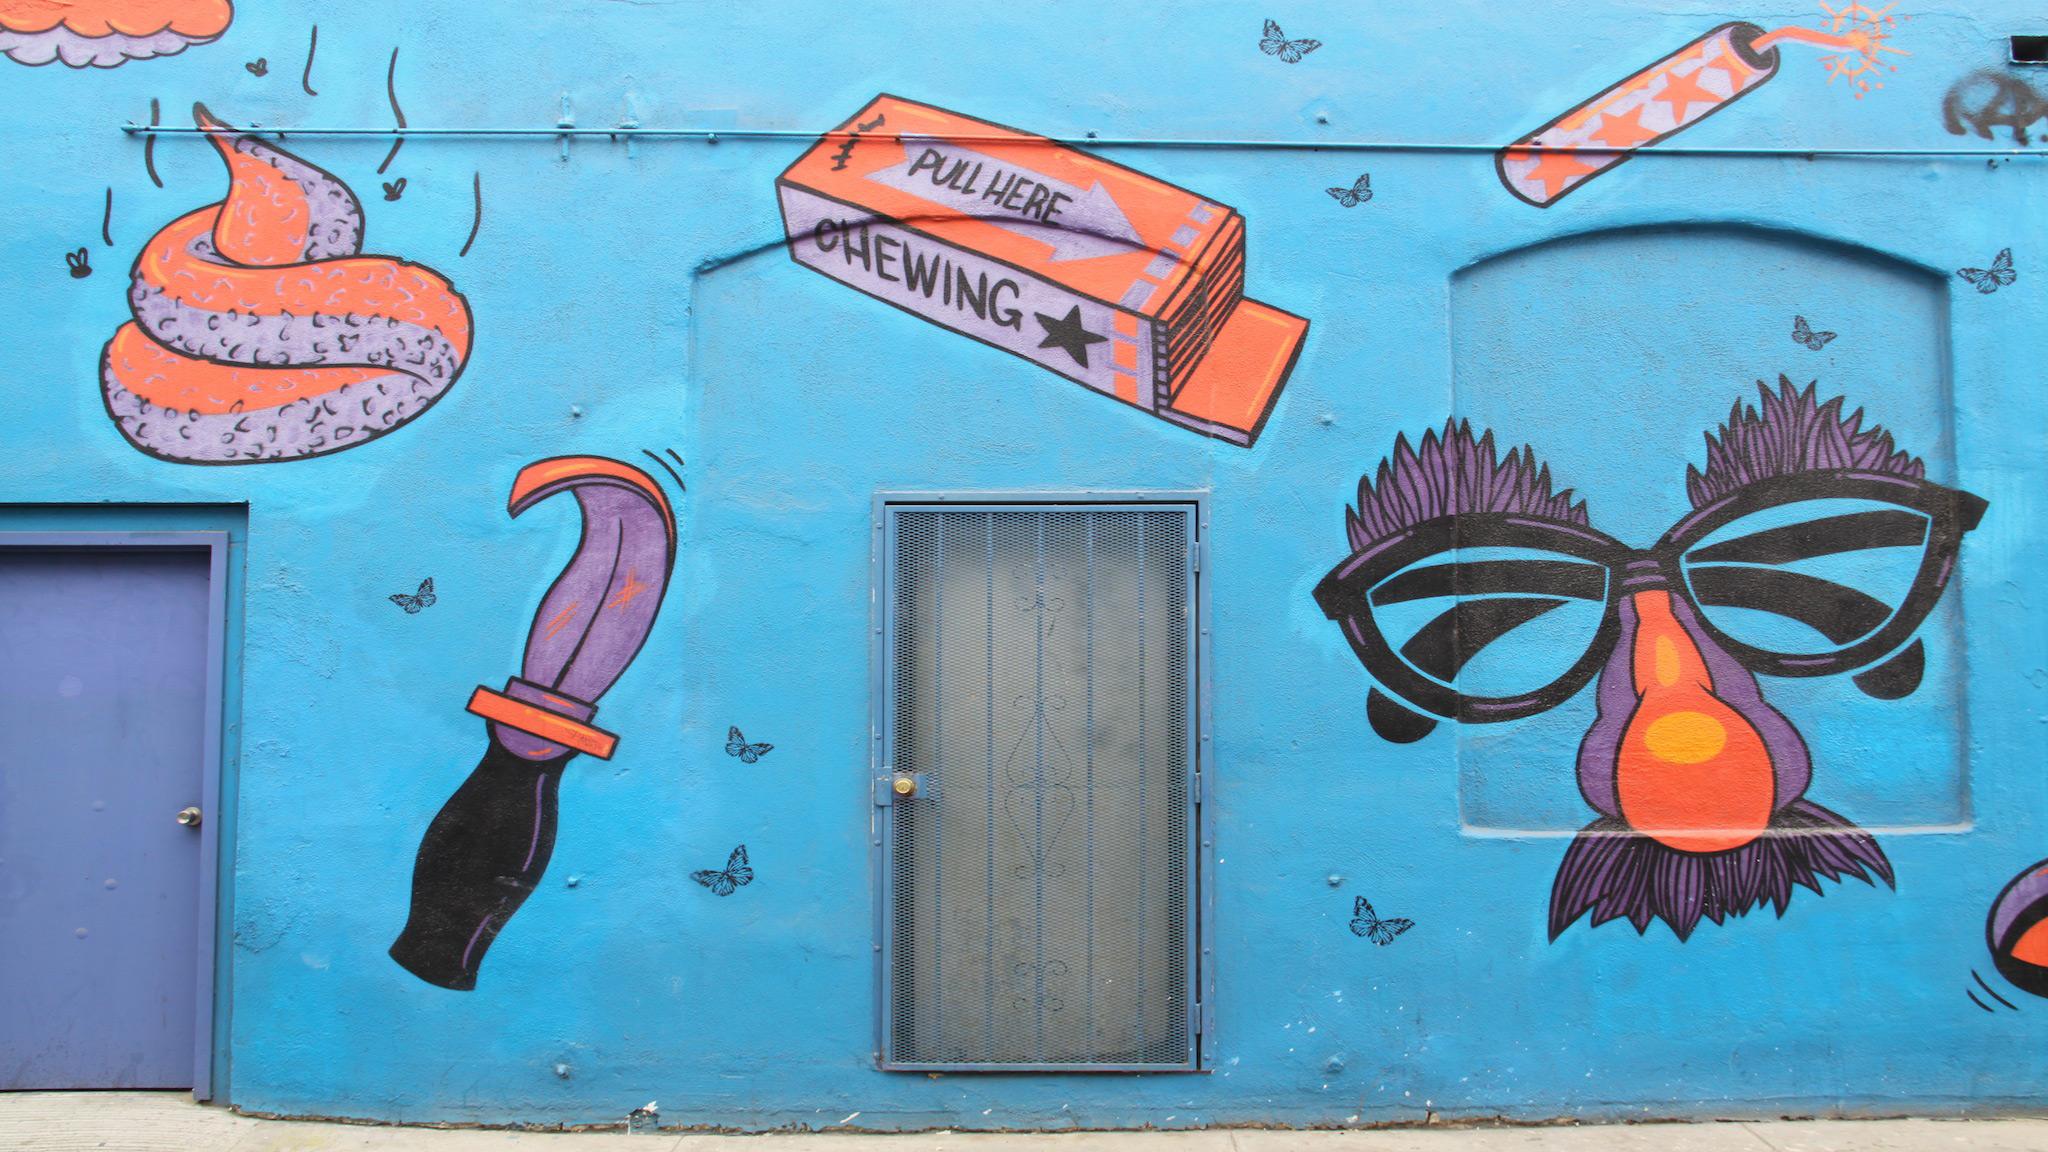 Wavecrest/Speedway, Venice Beach